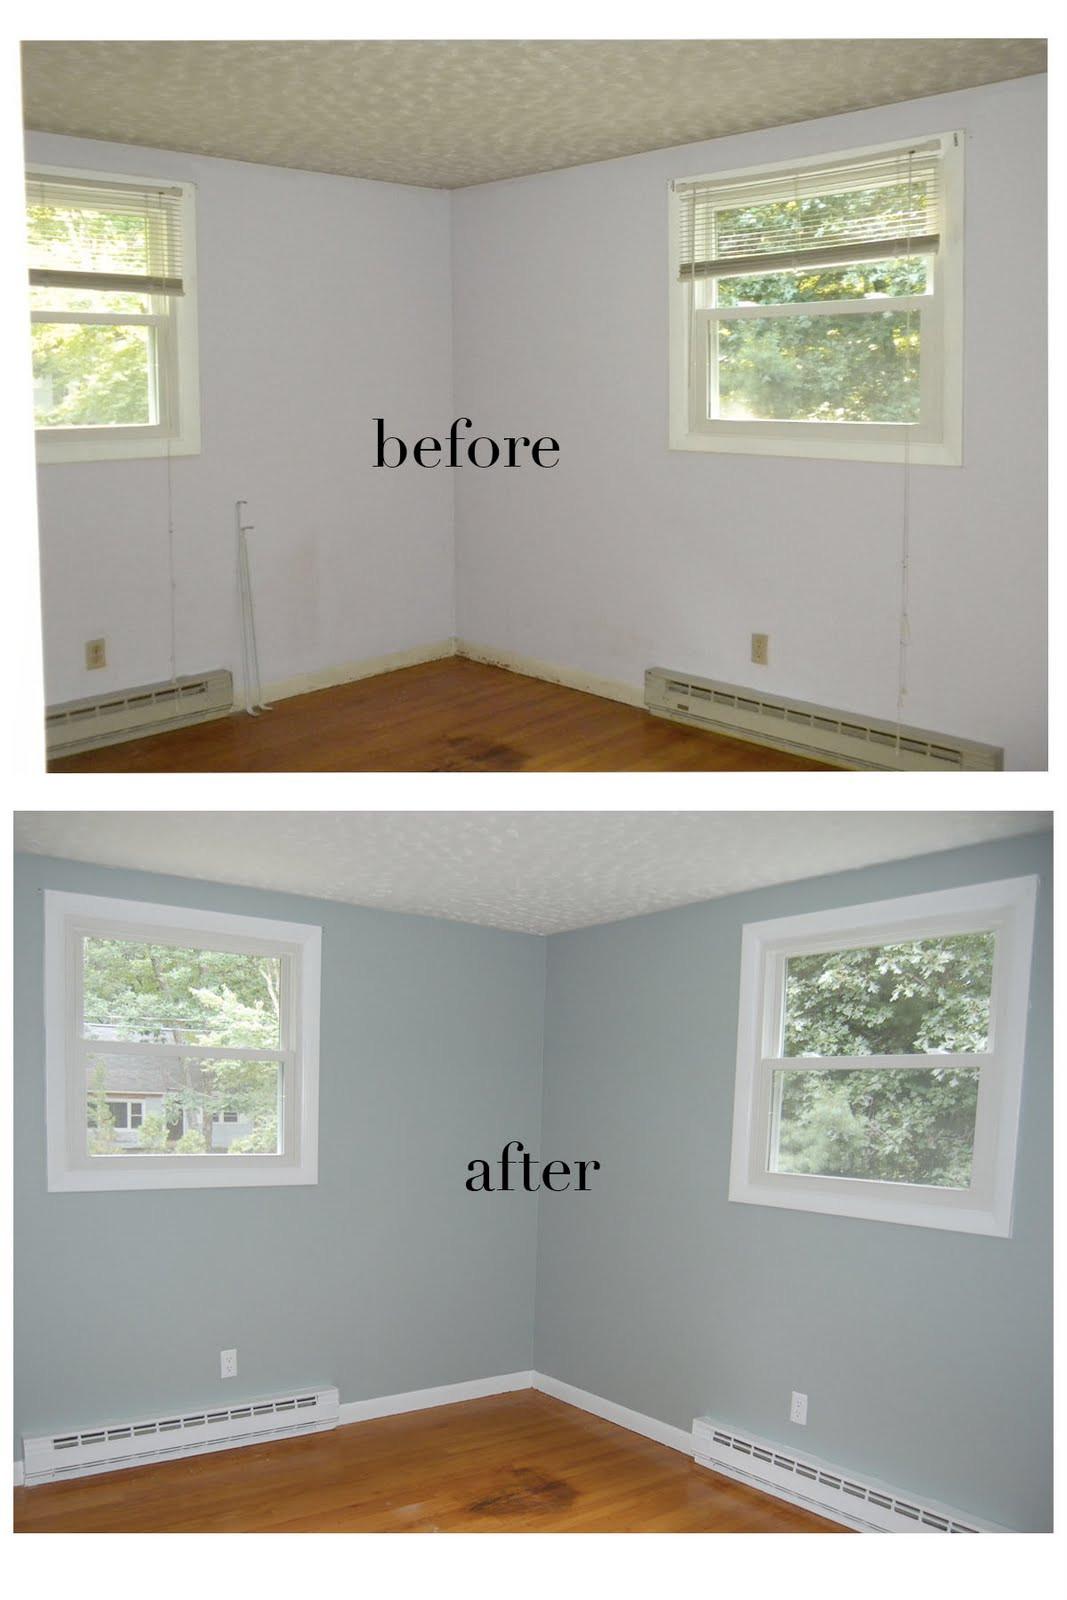 Best ideas about Glidden Paint Colors . Save or Pin Home Depot Glidden Paint Now.